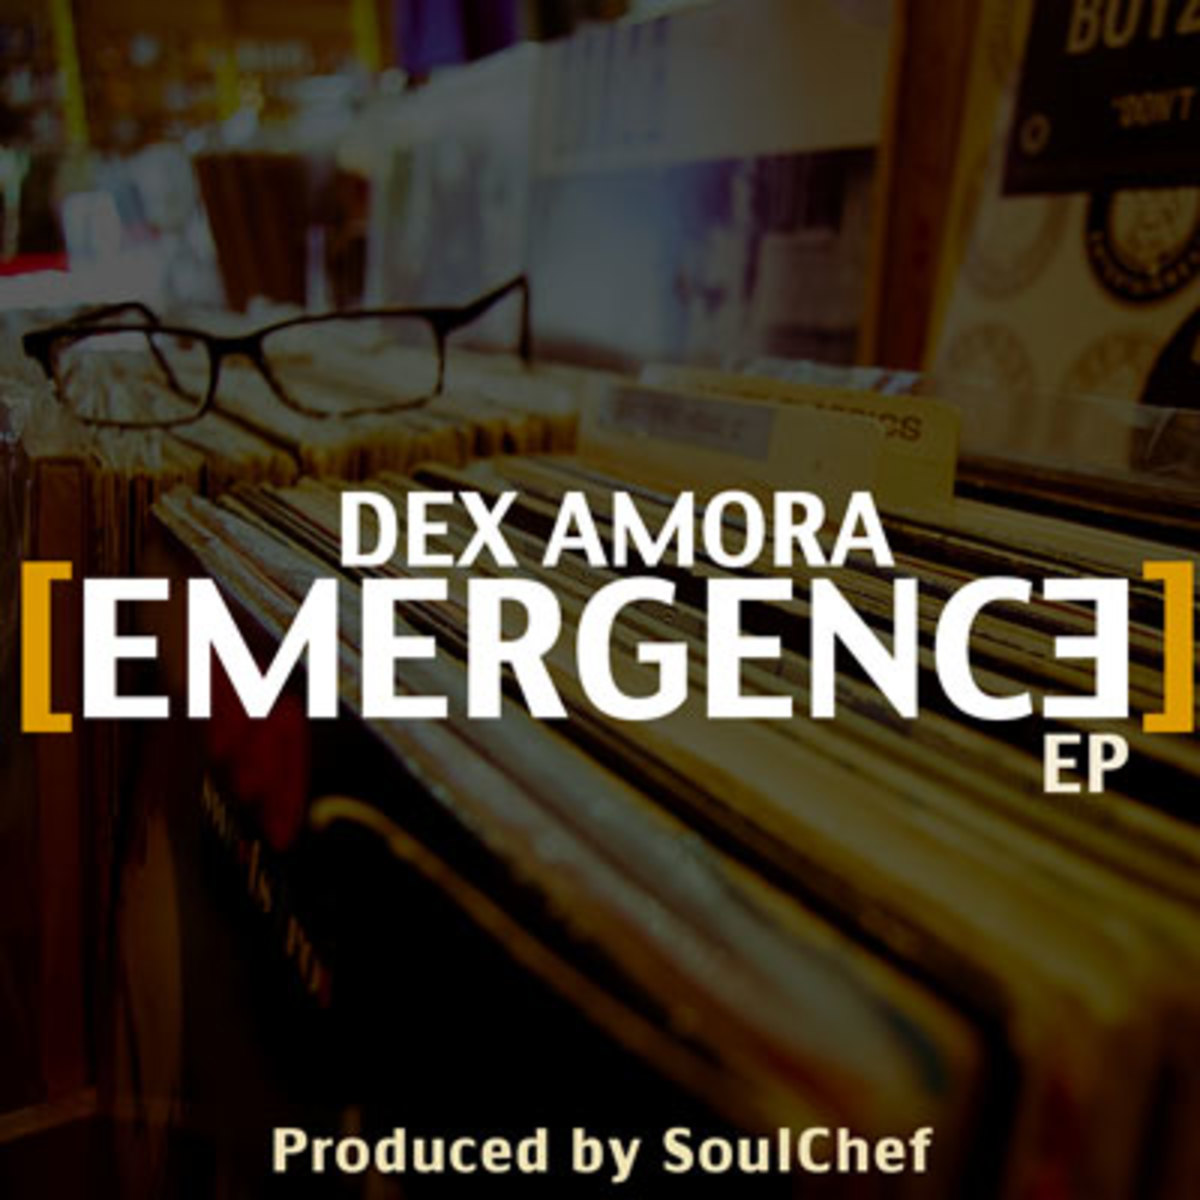 dexamora-emergence.jpg